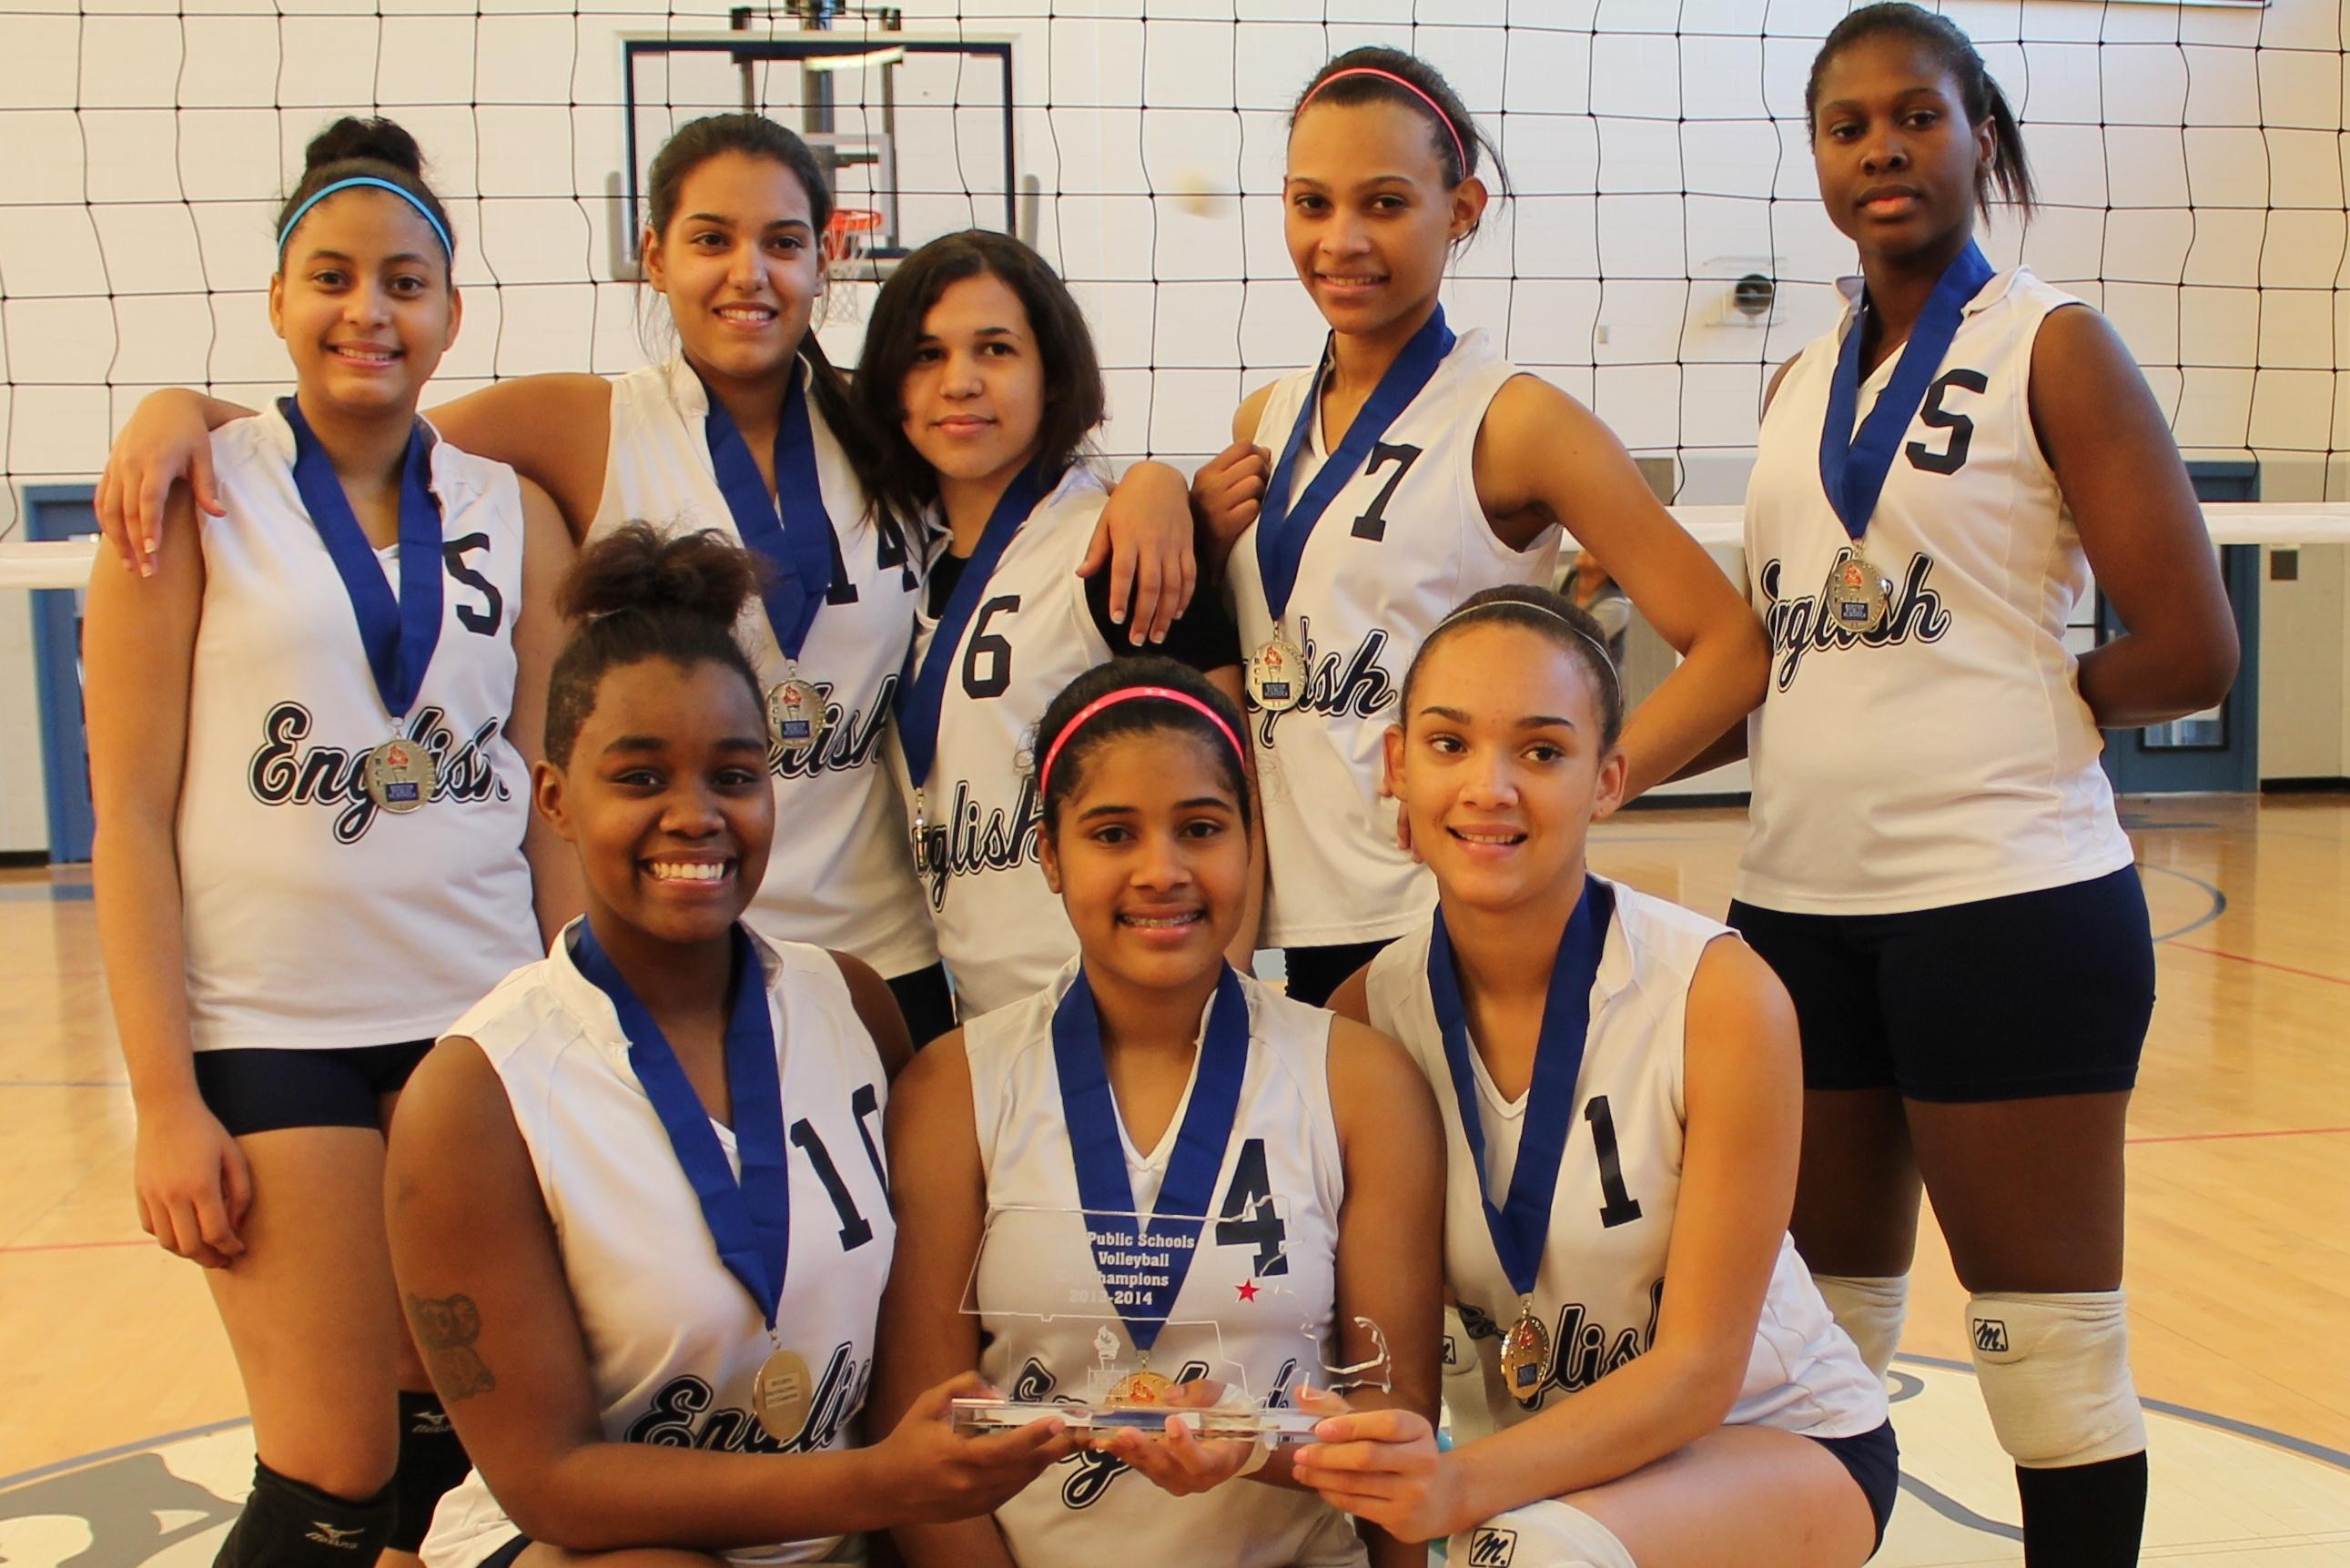 2013 Boston English volleyball championship